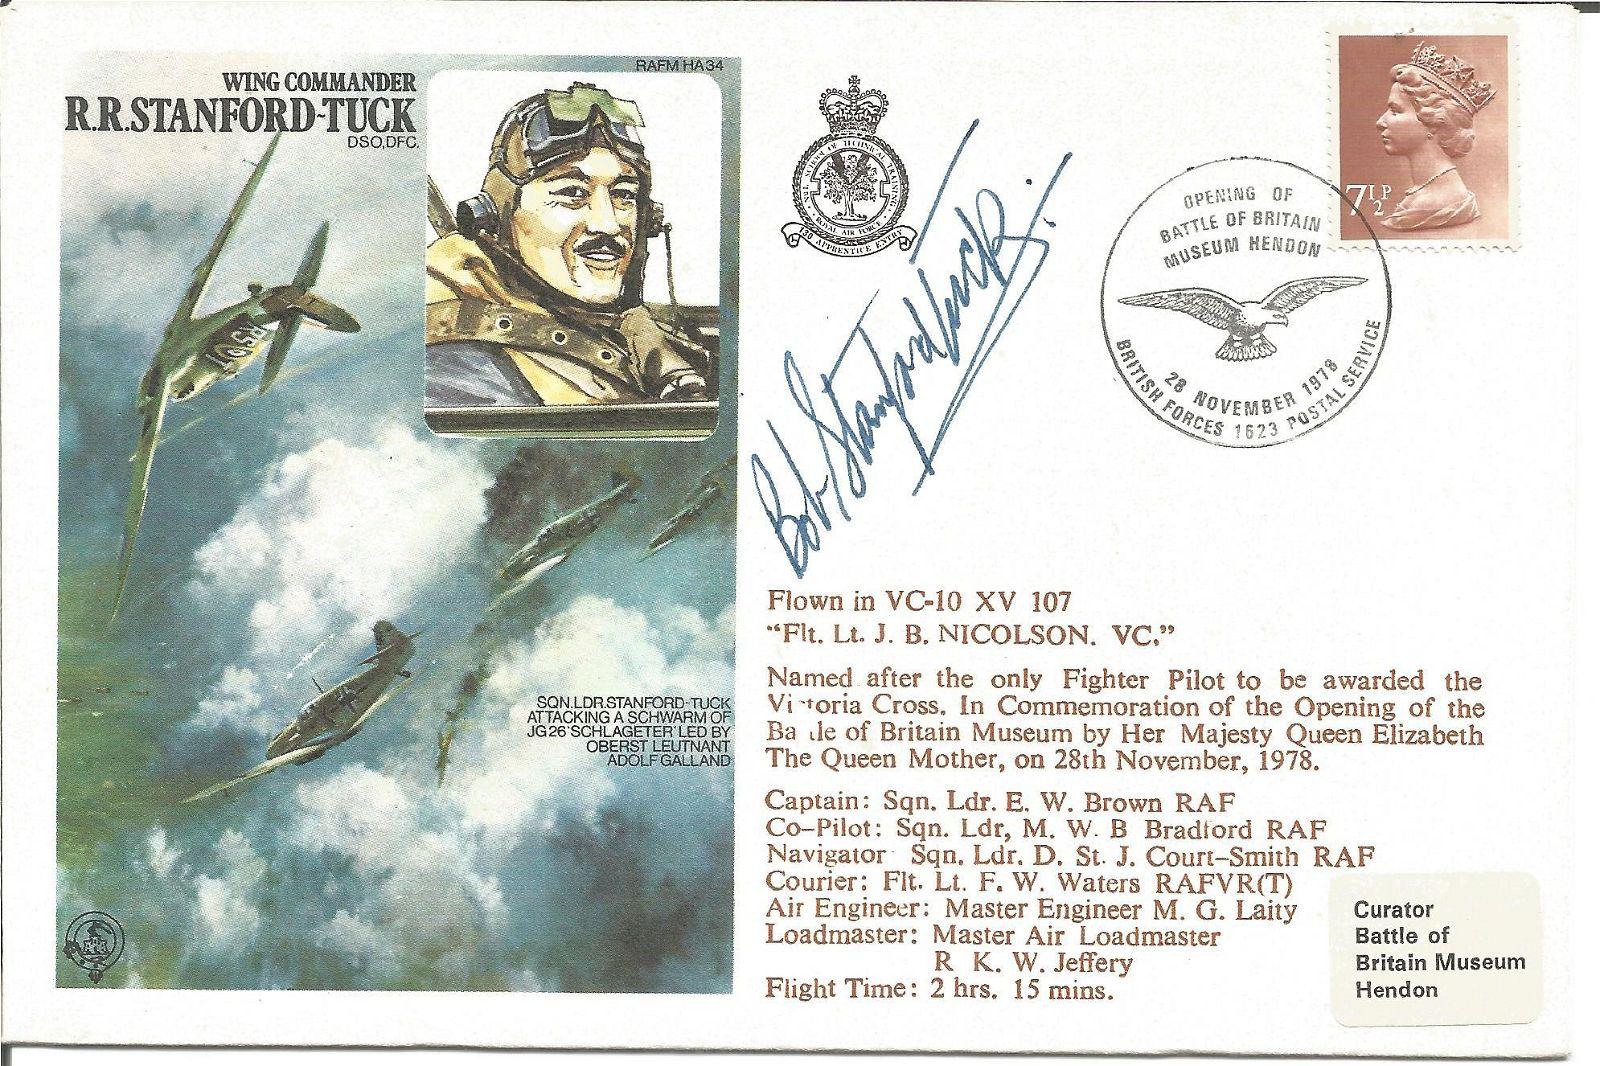 WW2 Battle of Britain fighter ace Wg Cdr Robert